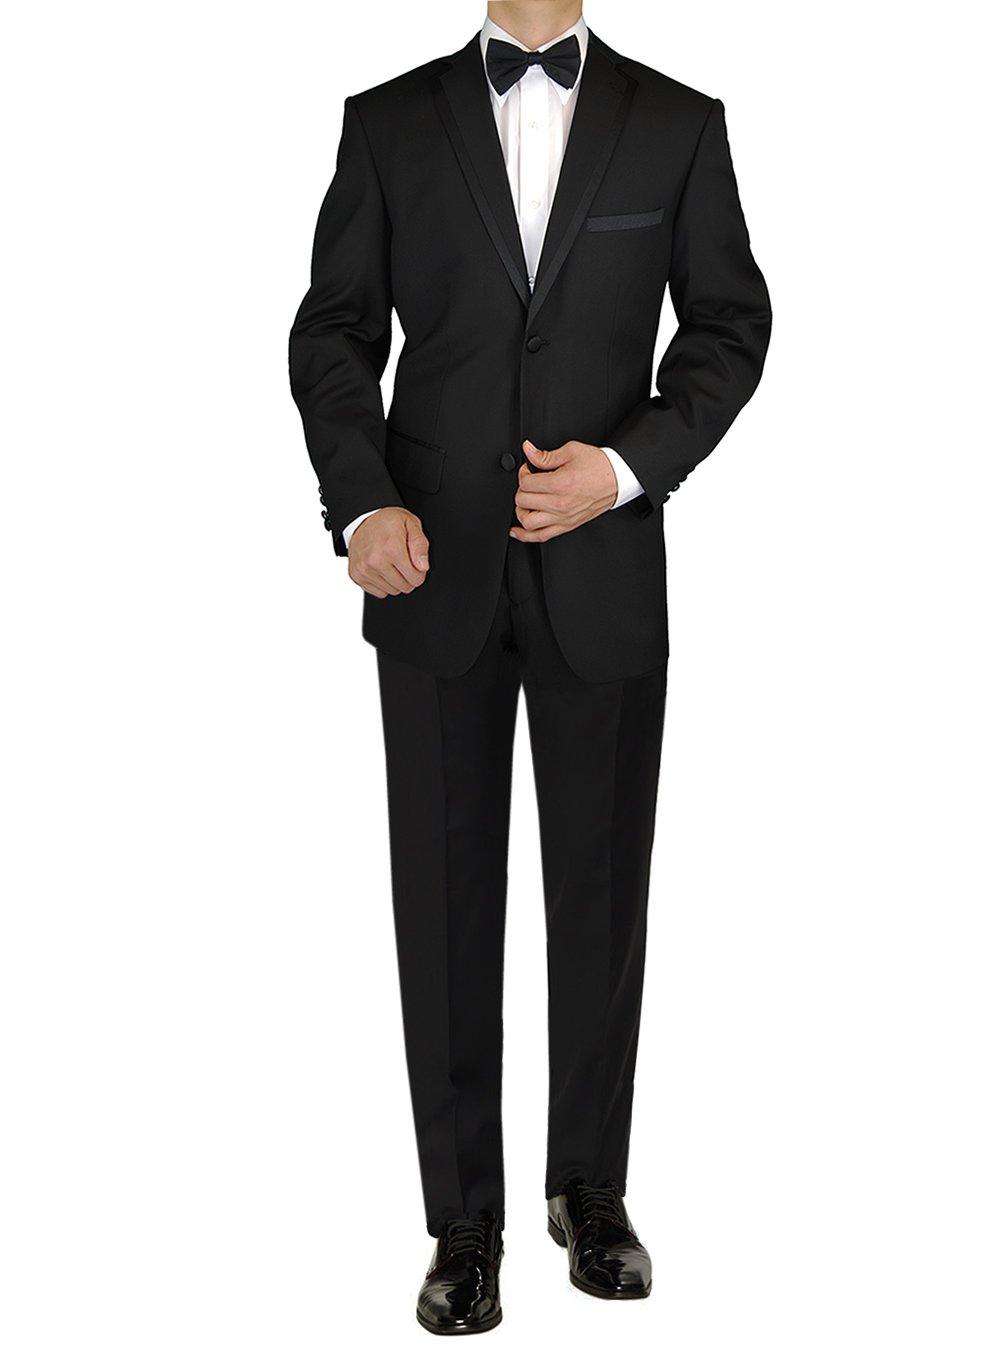 GN GIORGIO NAPOLI Men's Tuxedo Suit 2 Button Notch Lapel Adjustable Pants Black (48 Regular US,black)